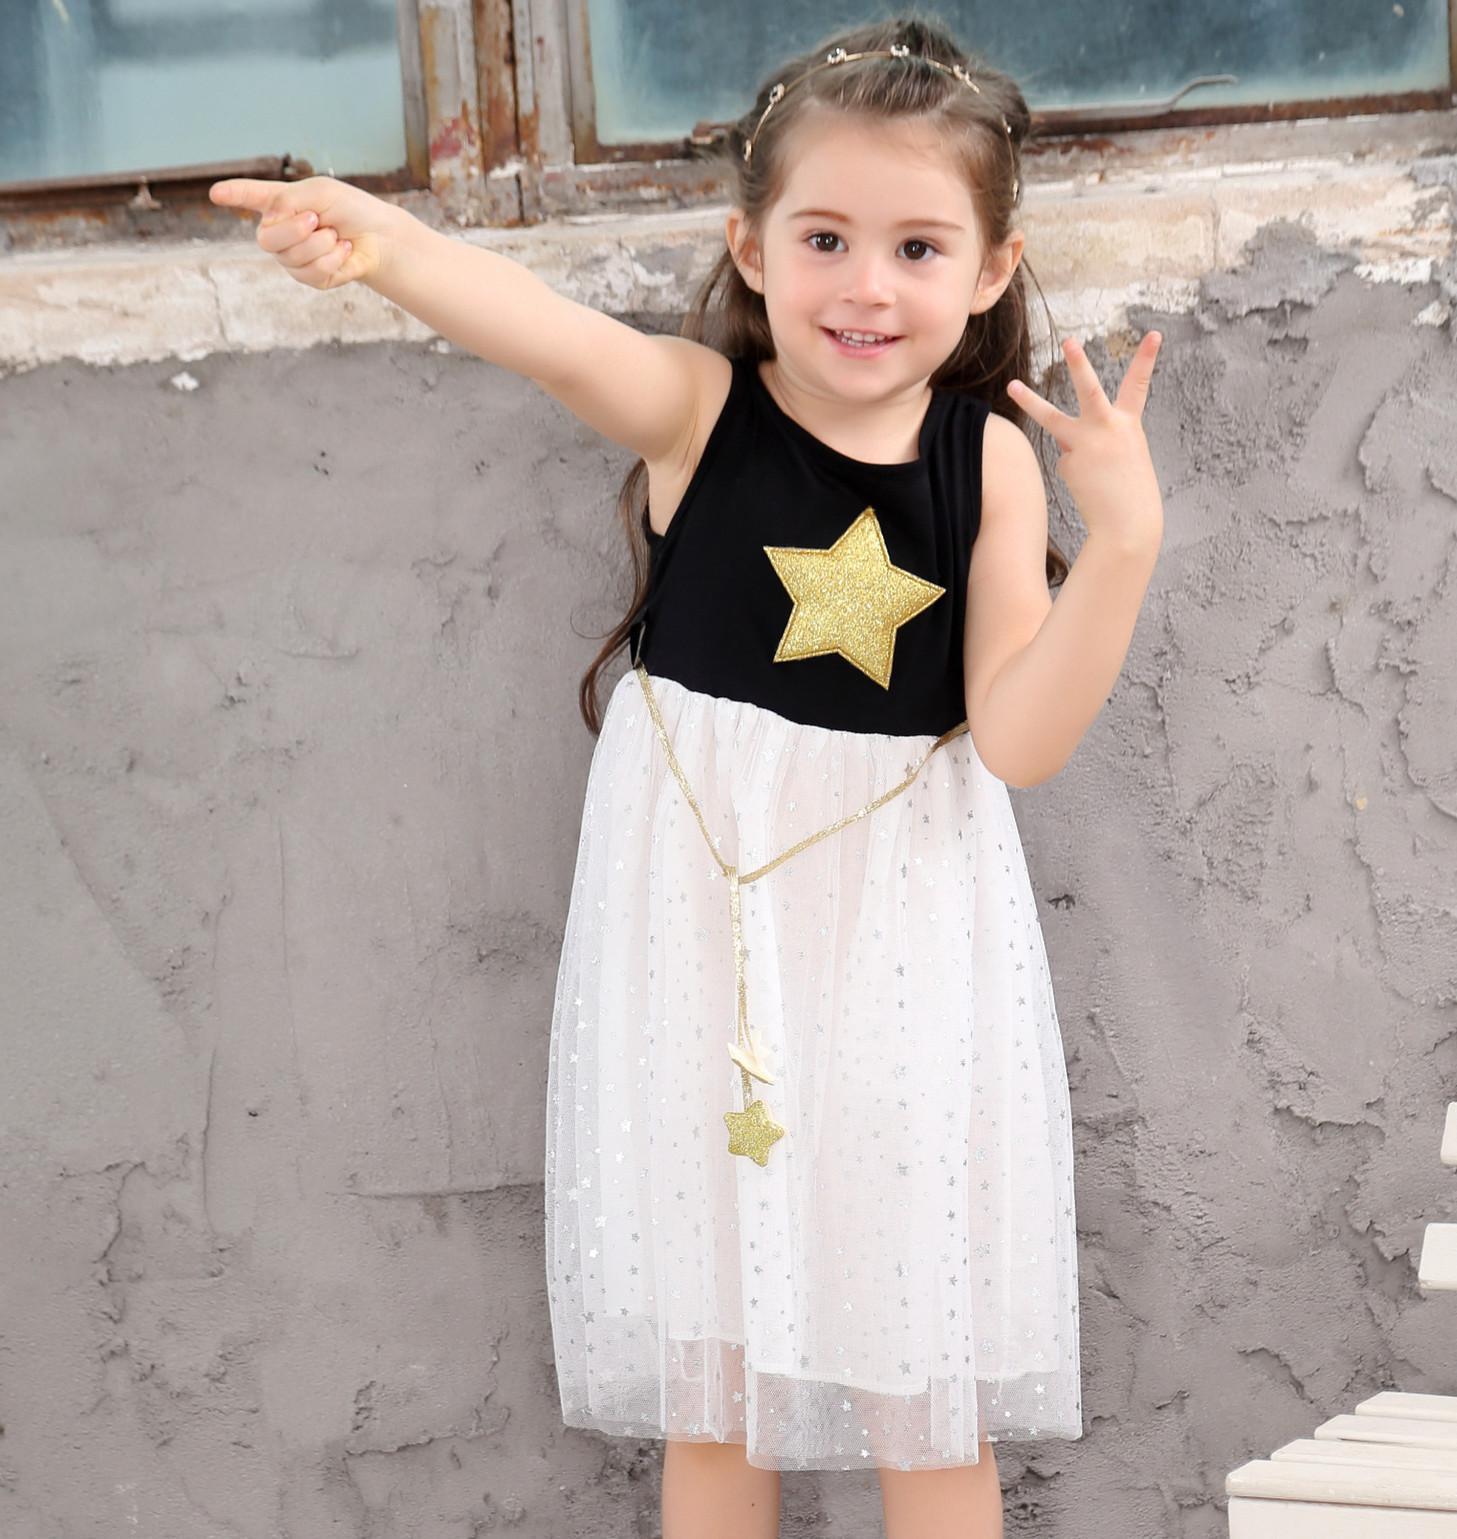 36fbb43461b1d Hot 2018 new dresses girls wear five-pointed star children s dress princess  dress cotton dress free shipping